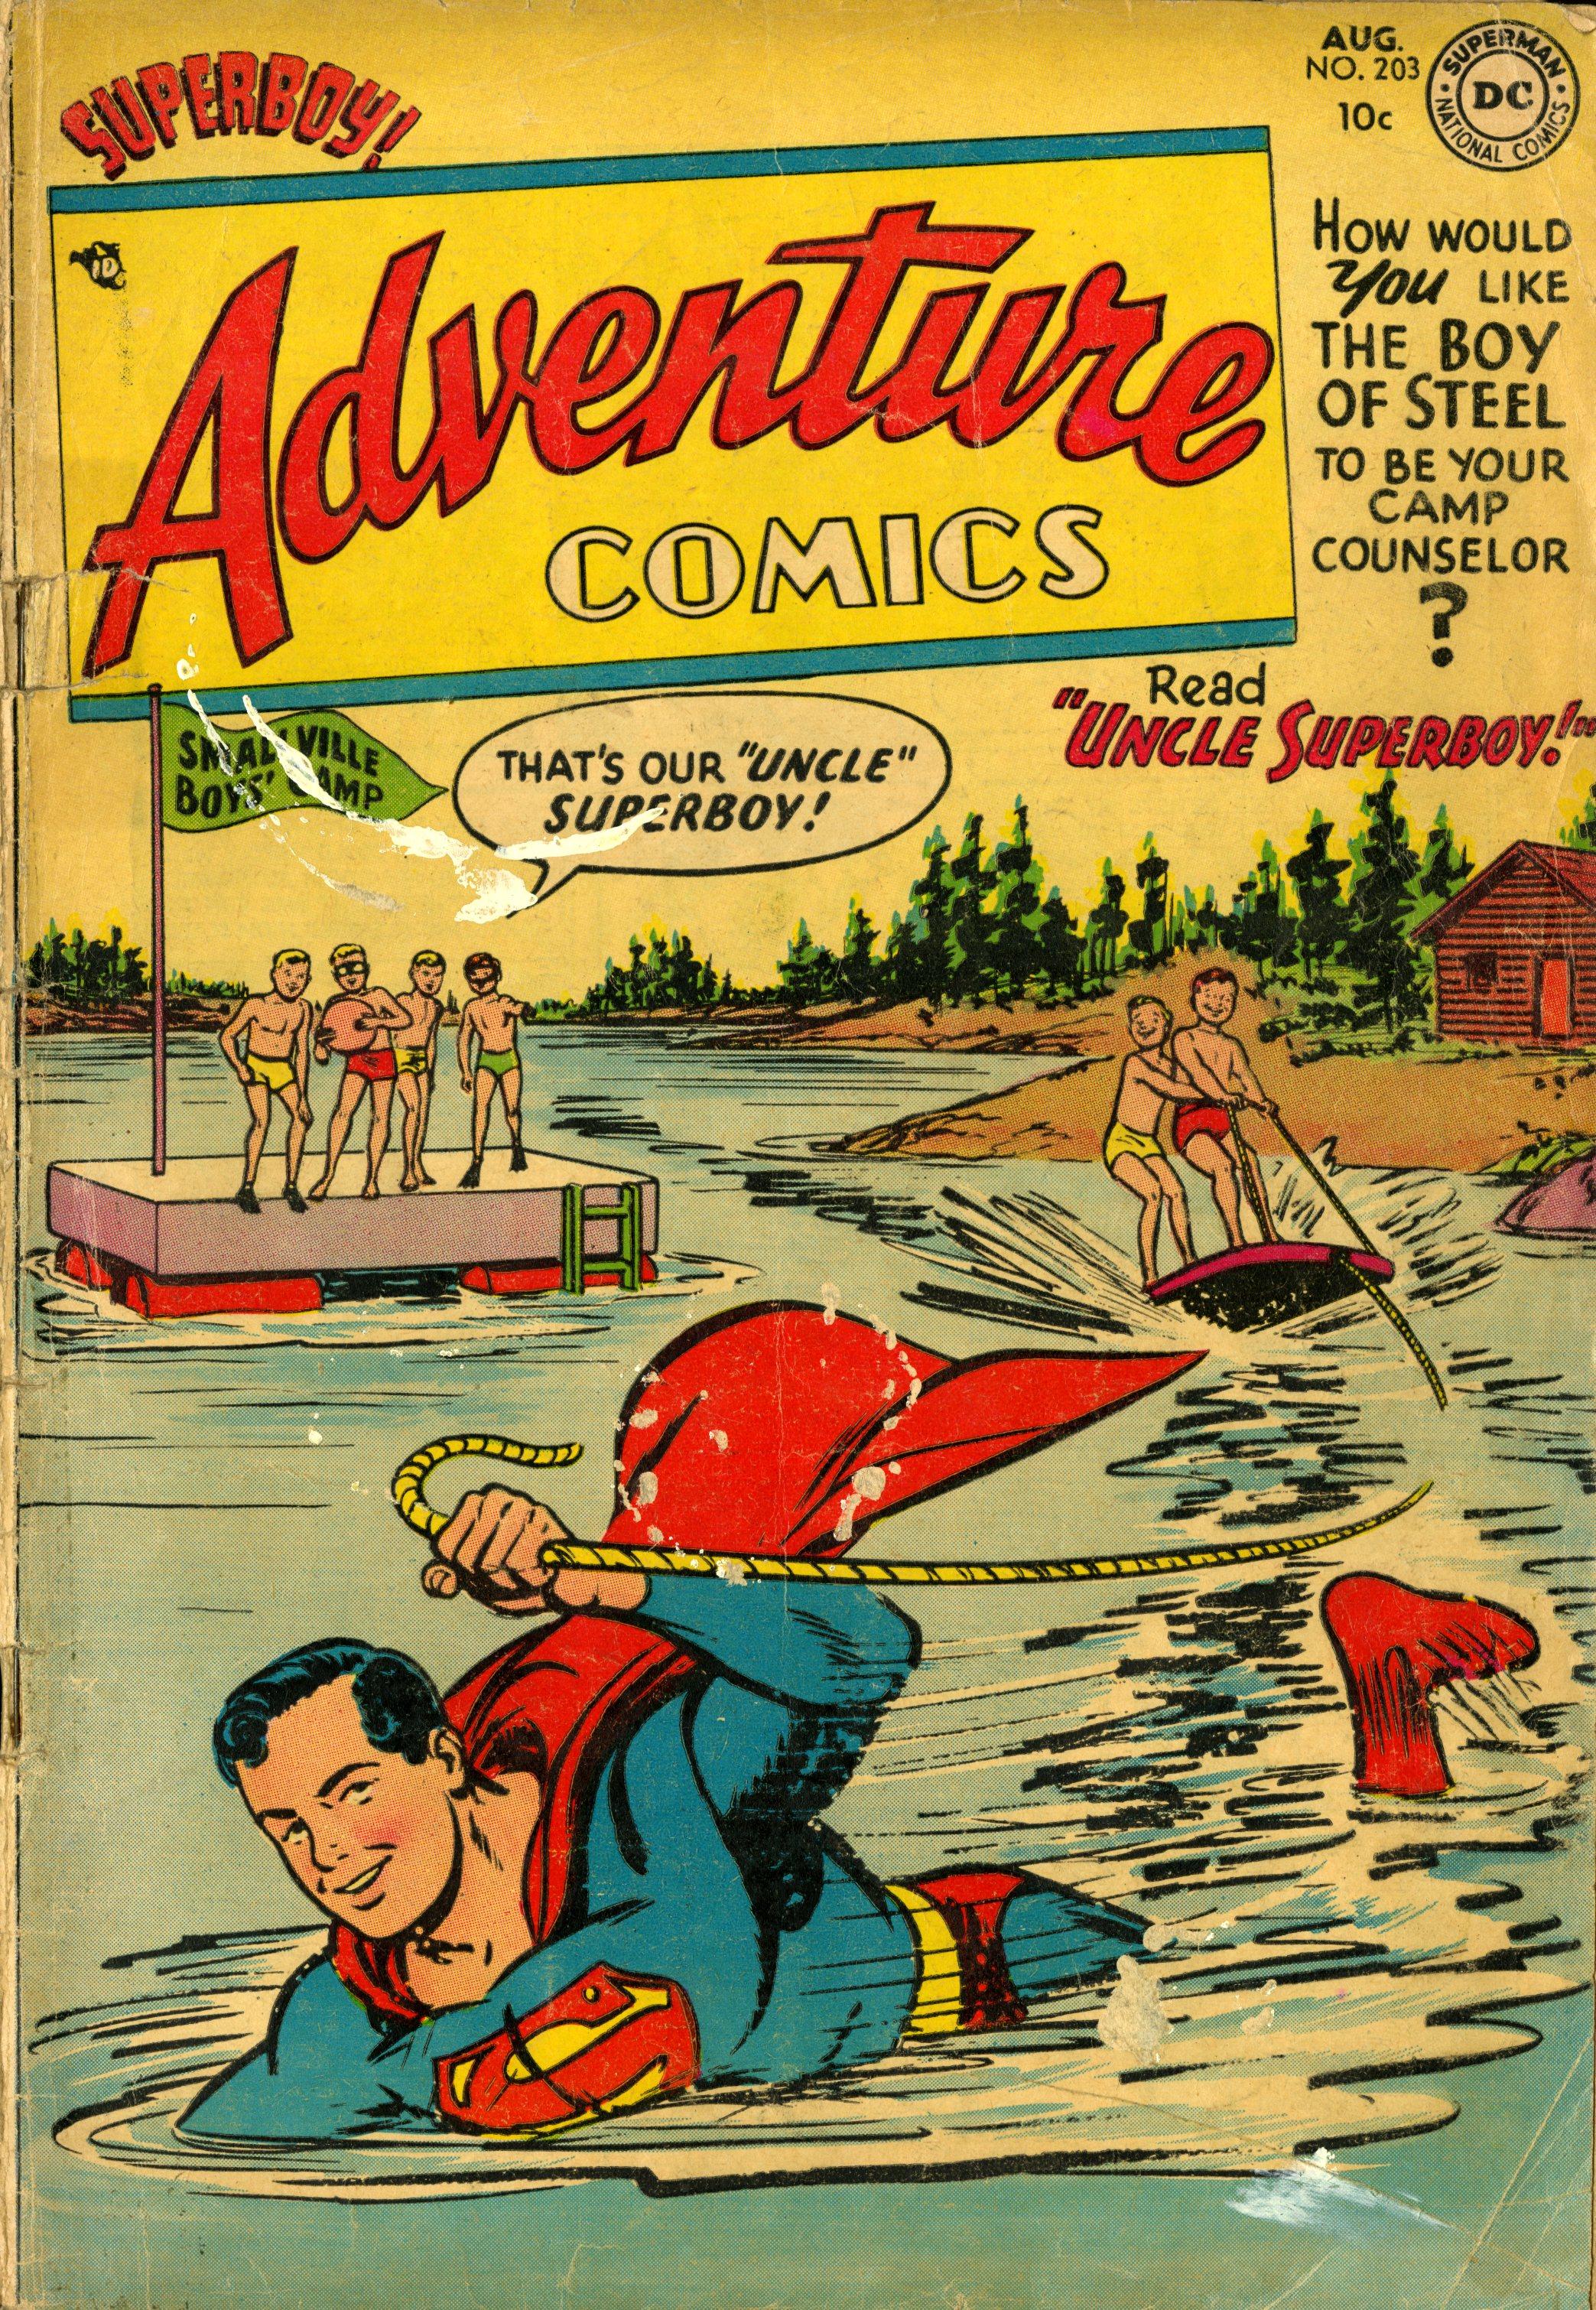 Adventure Comics 203 August 1954.jpg